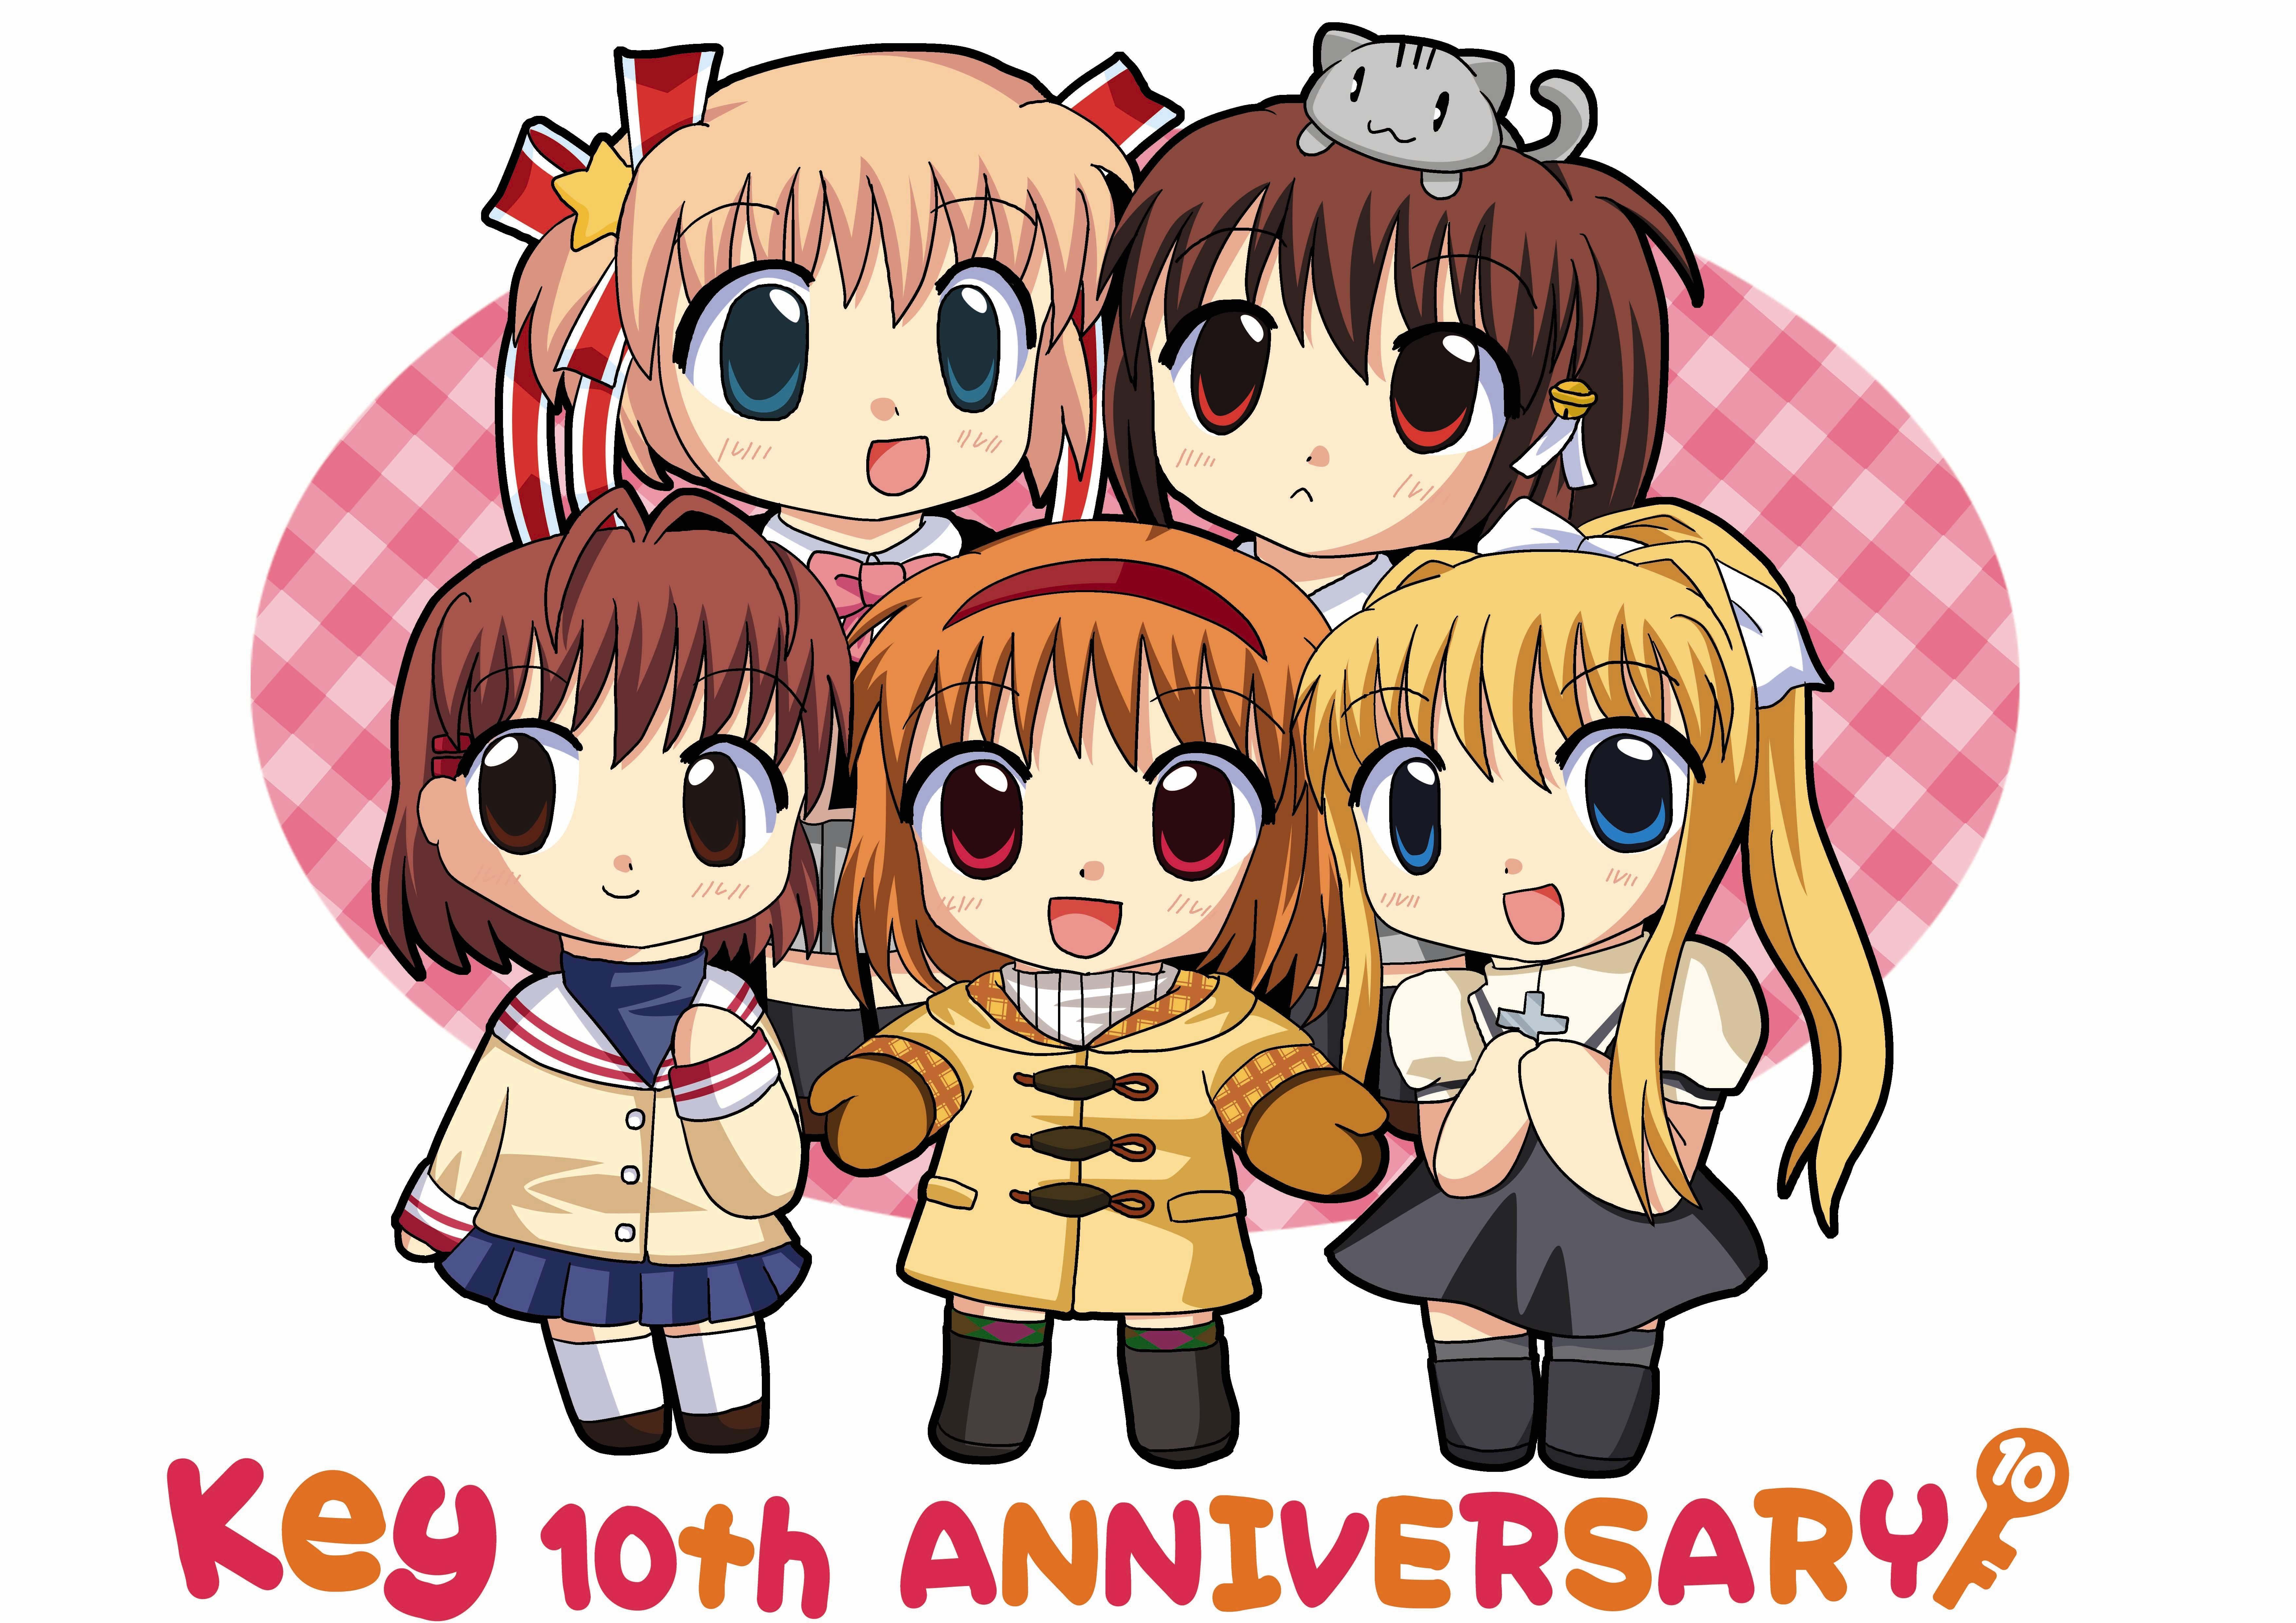 Chibi Little Clannad Kanon Kamio Misuzu Furukawa Nagisa Anime Natsume Rin Girls Kamikita Komari Air Wallpaper